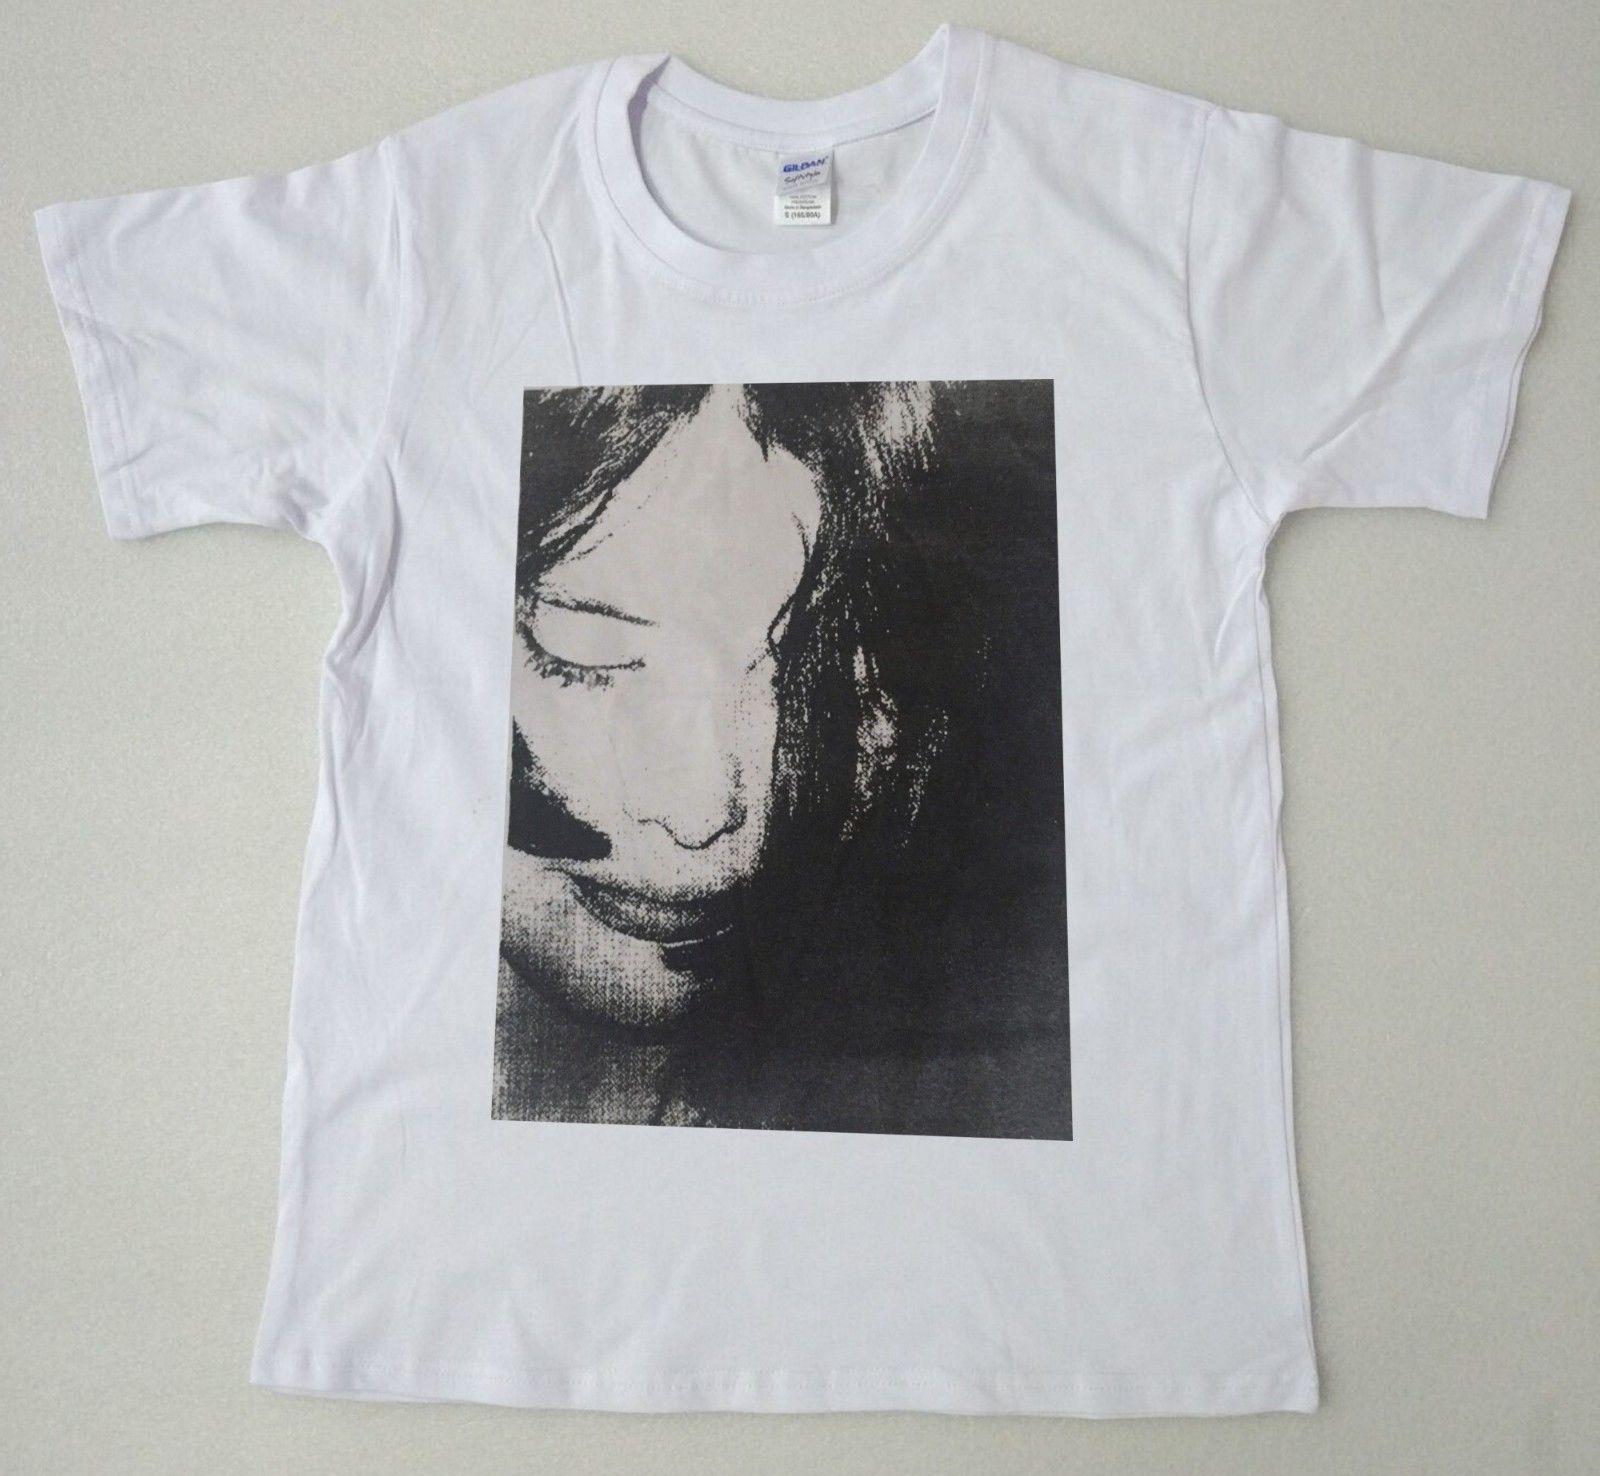 36d43a7d VINTAGE RARE SLOWDIVE Band Rock Shoegaze T Shirt Men Size S 2XL Reprint  Rare Jersey Print T Shirt As T Shirts Fun Tee Shirts From Docup, $16.24|  DHgate.Com